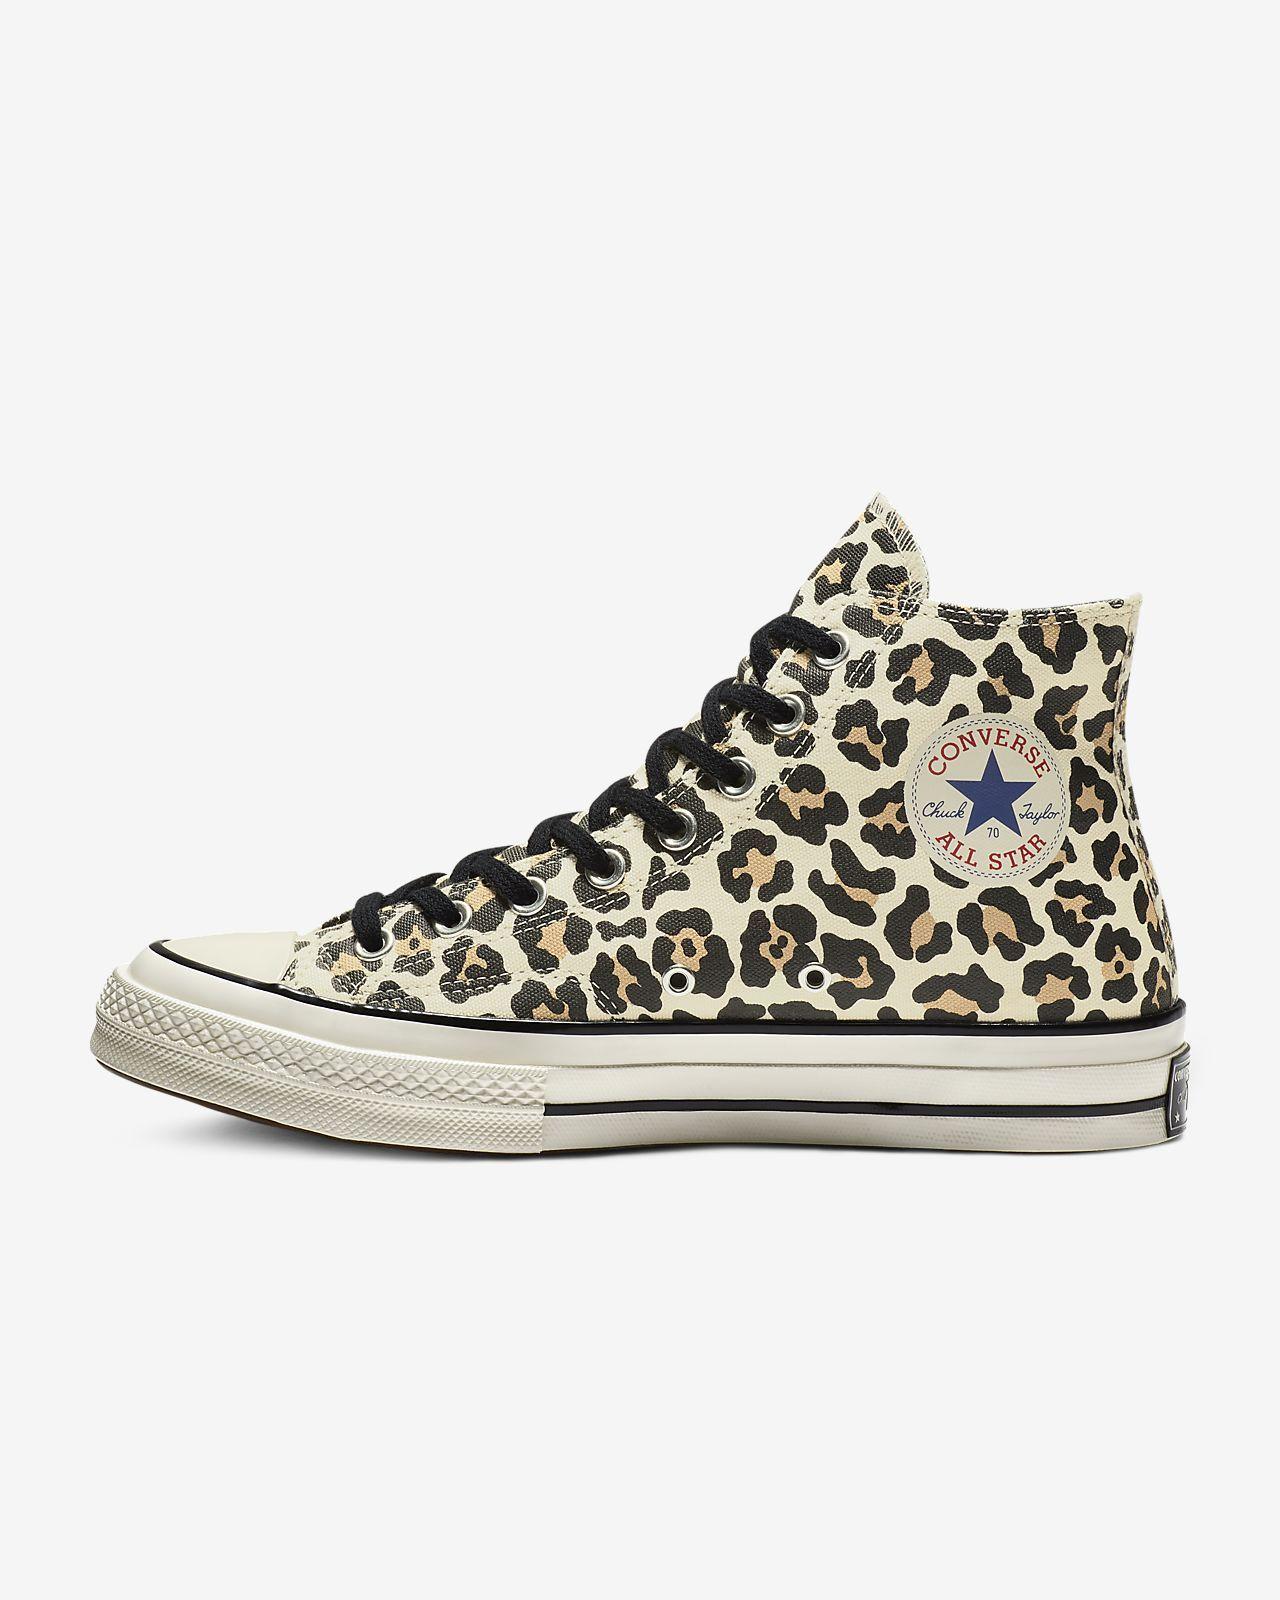 9149cfb511d0 Converse Chuck 70 Print High Top Unisex Shoe | Closet in 2019 ...